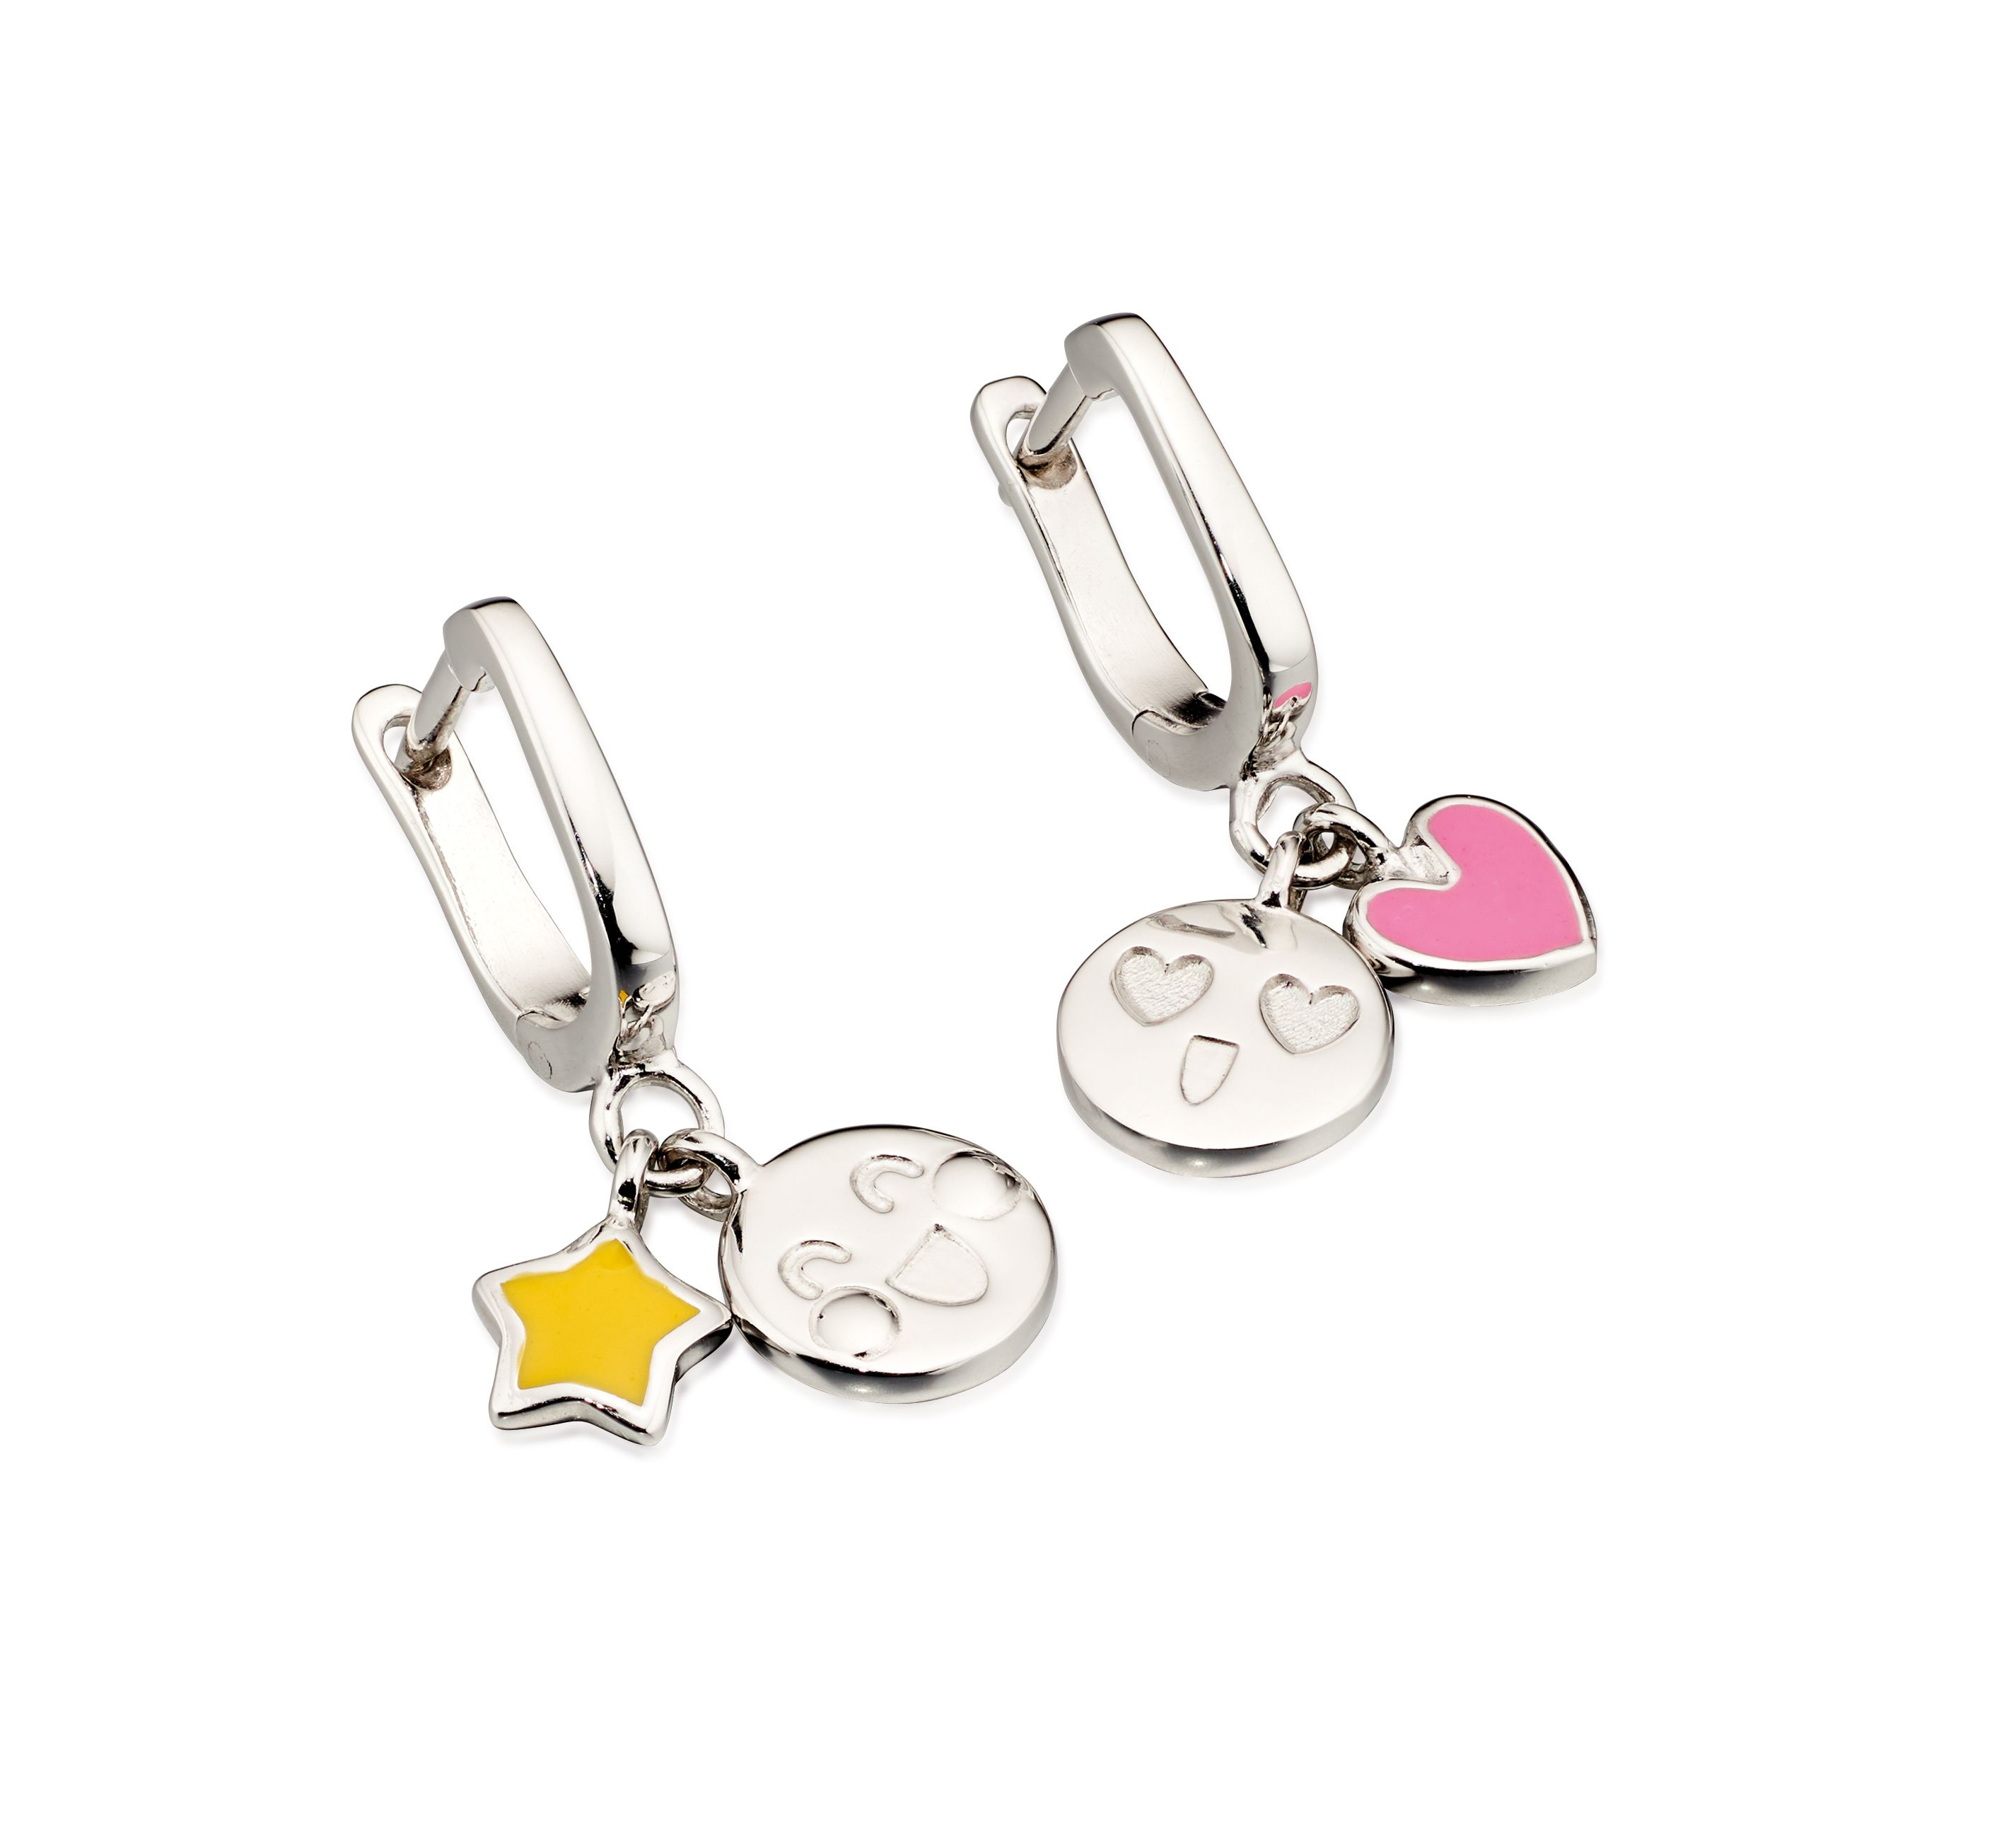 D for Diamond Childrens 925 Sterling Silver Pink & Yellow Enamel Emoticon Emoji Charm Hoop Earrings